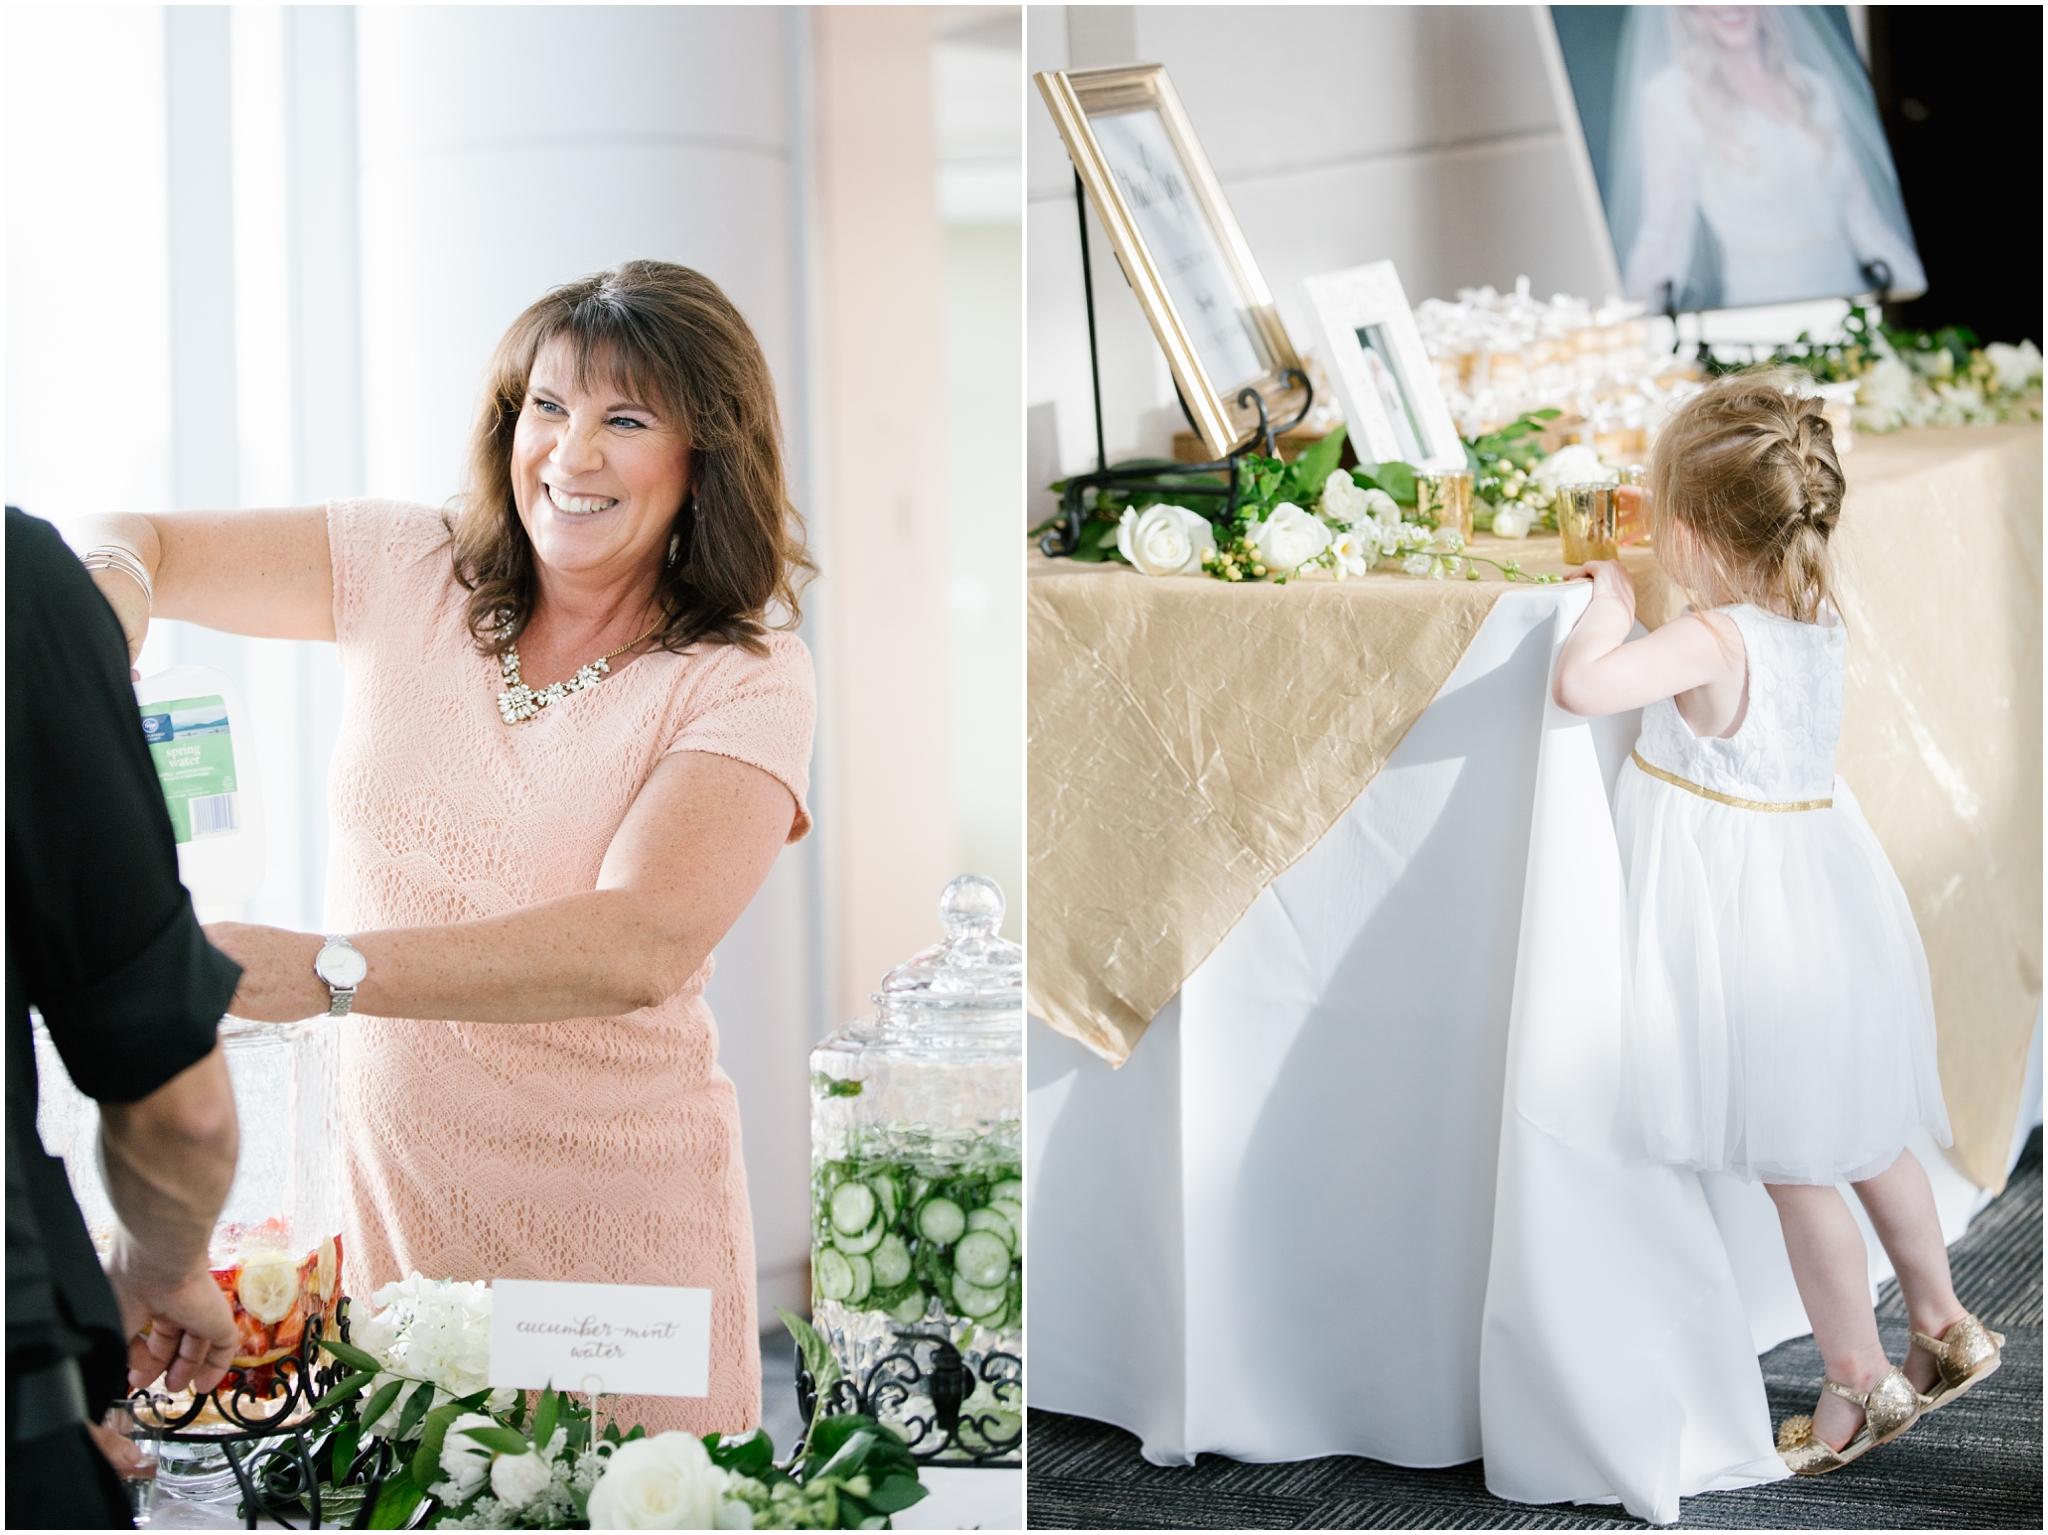 CherylandTyler-430_Lizzie-B-Imagery-Utah-Wedding-Photographer-Salt-Lake-City-Temple-Wells-Fargo-Building-Reception.jpg